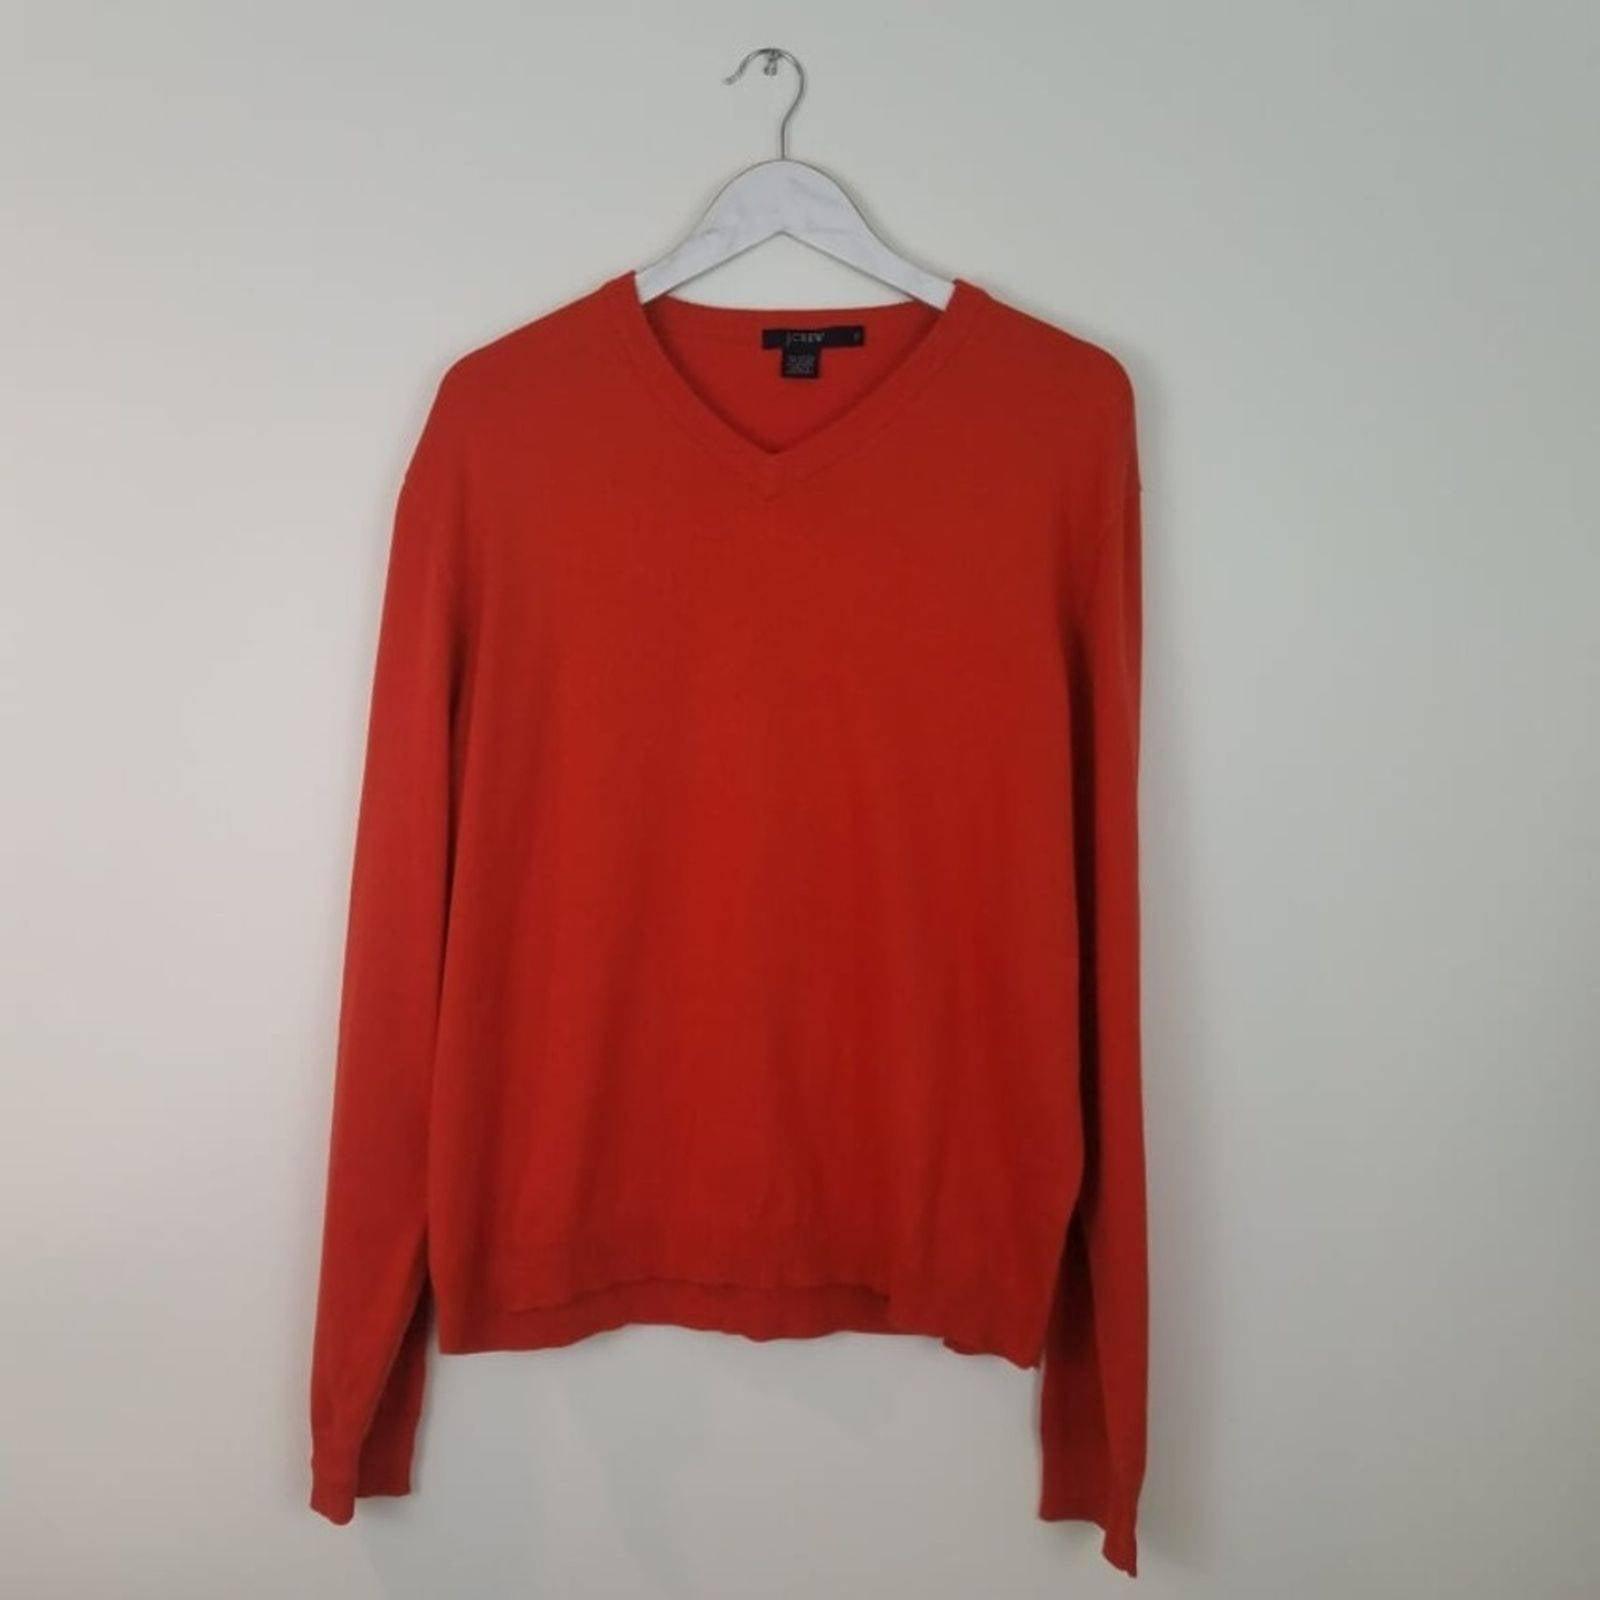 J. CREW V Neck Burnt Orange Sweater XL